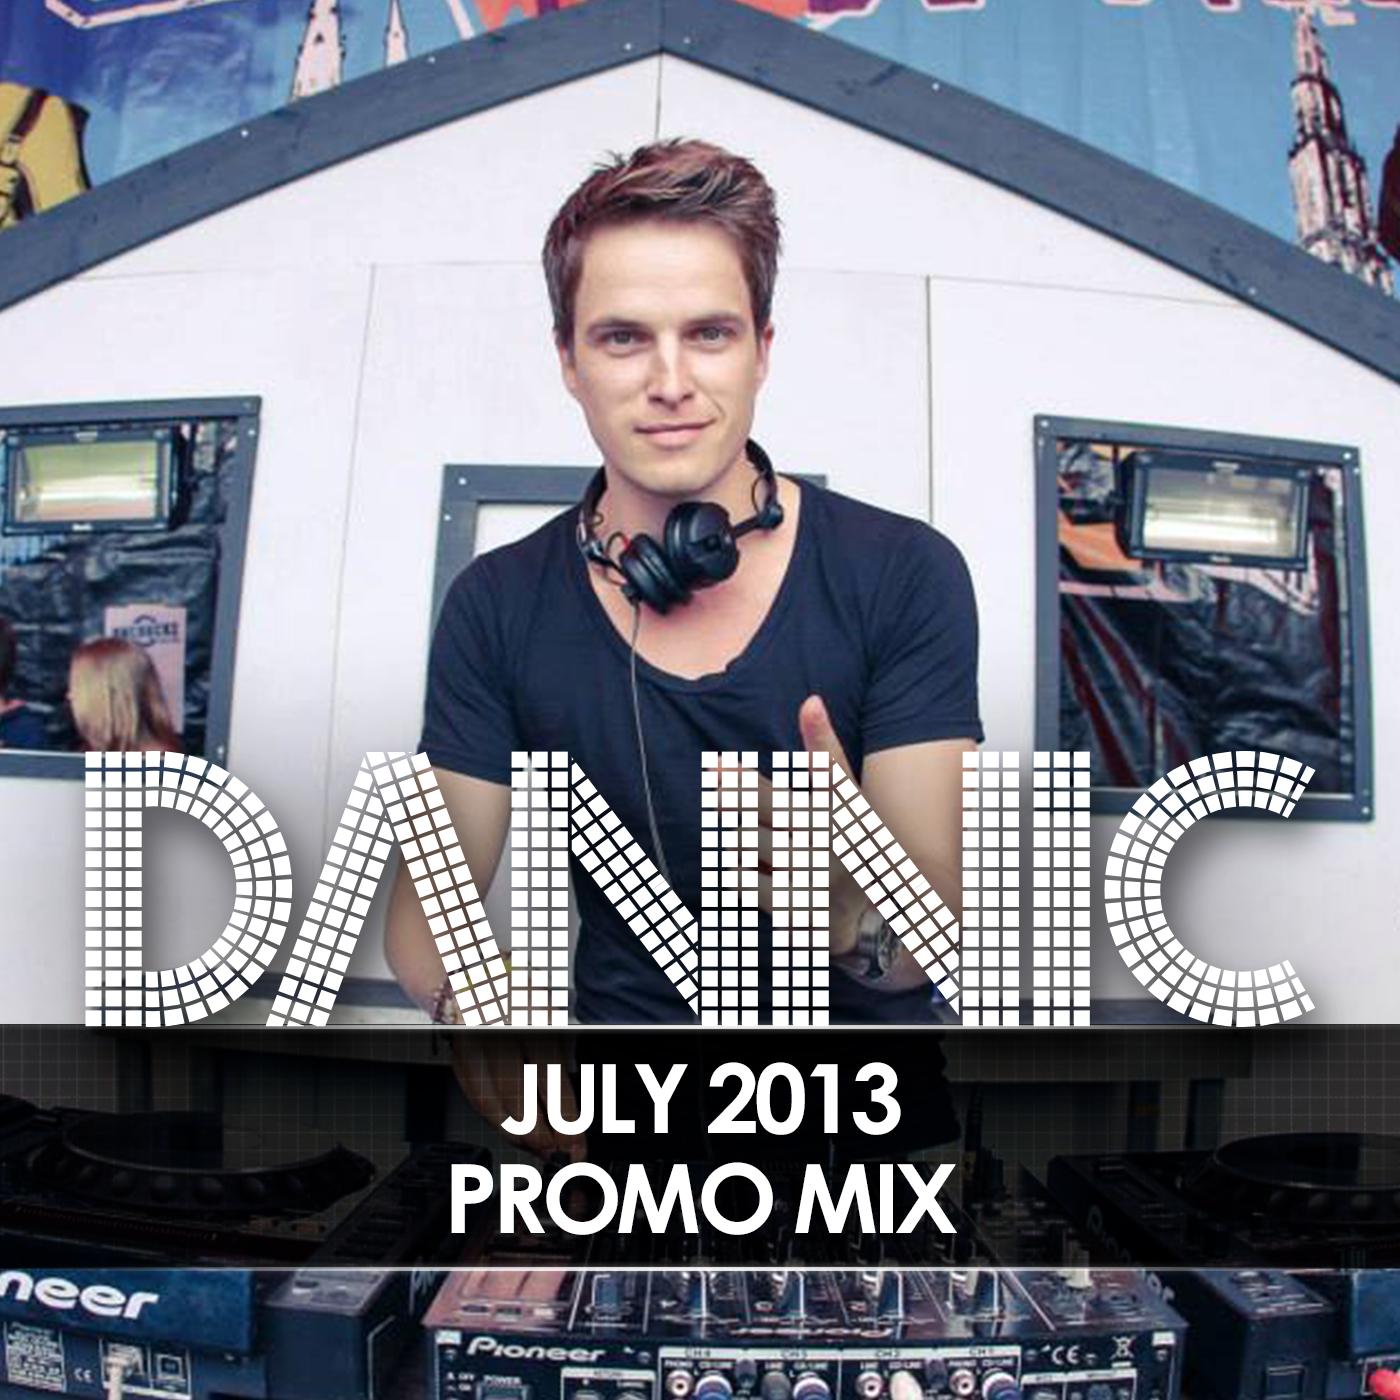 DANNIC - July 2013 Promo Mix